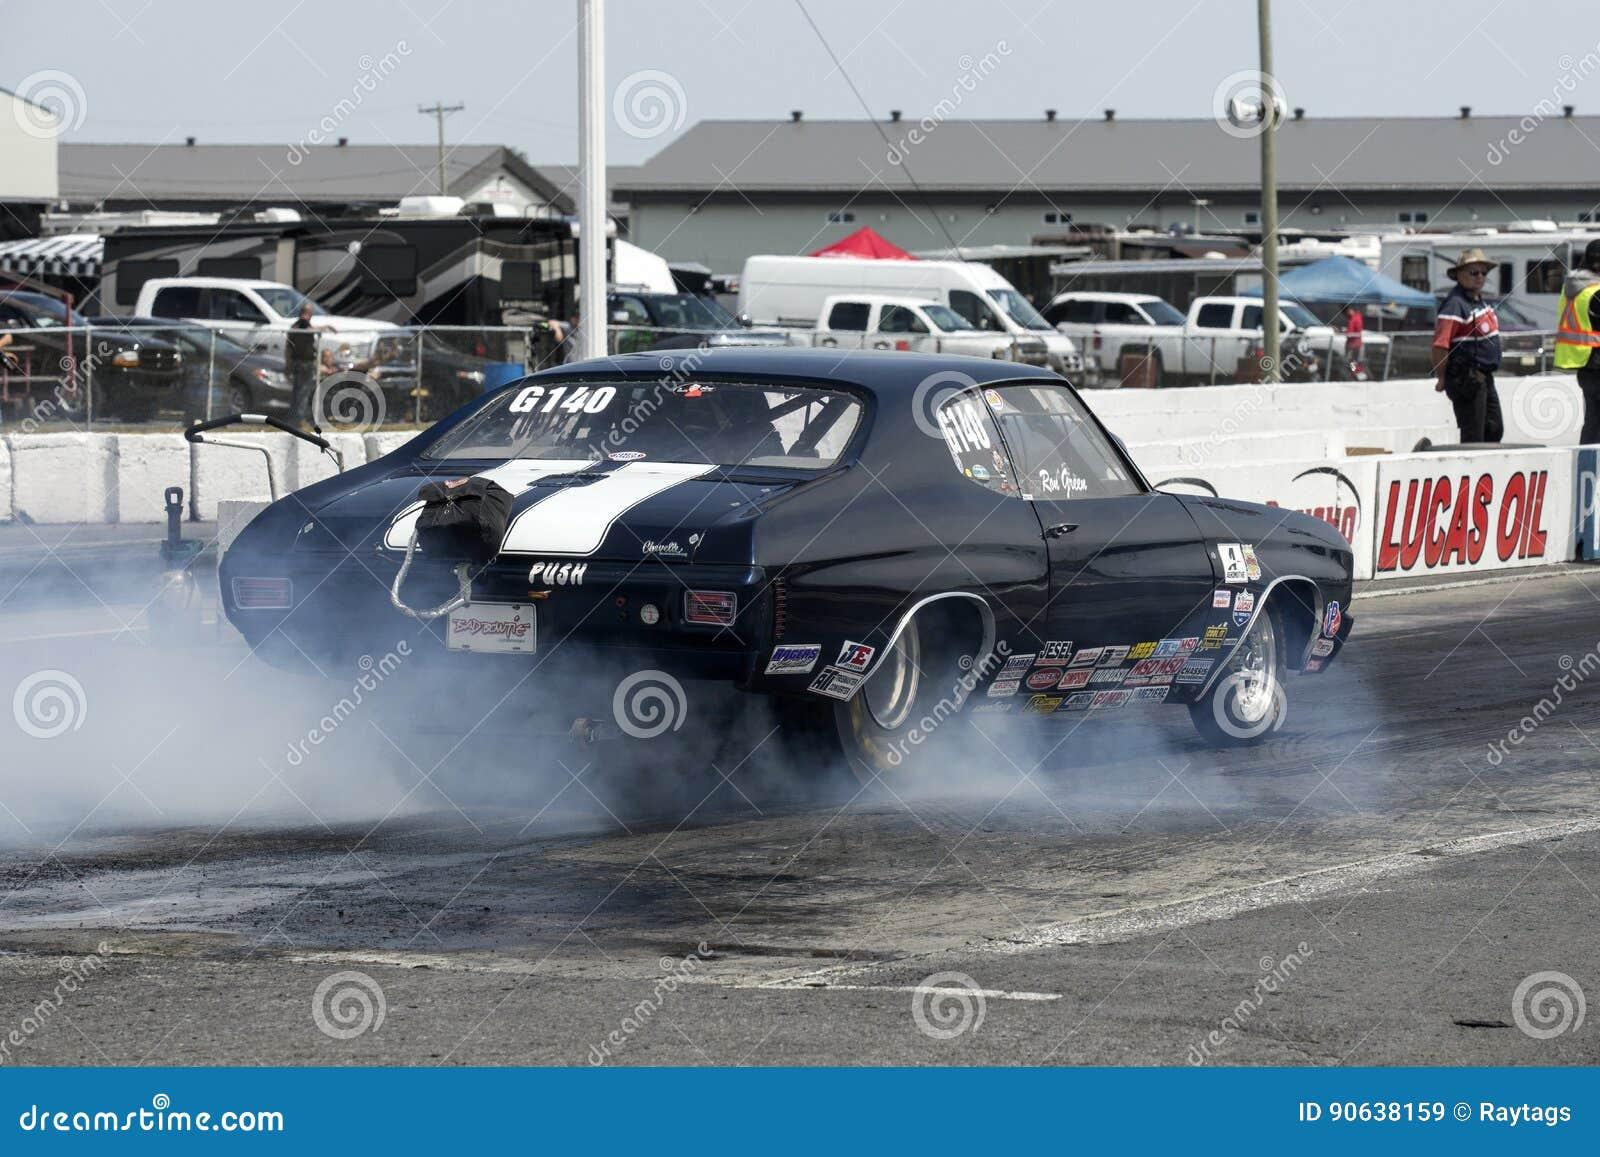 burnout championship drag racing download full version